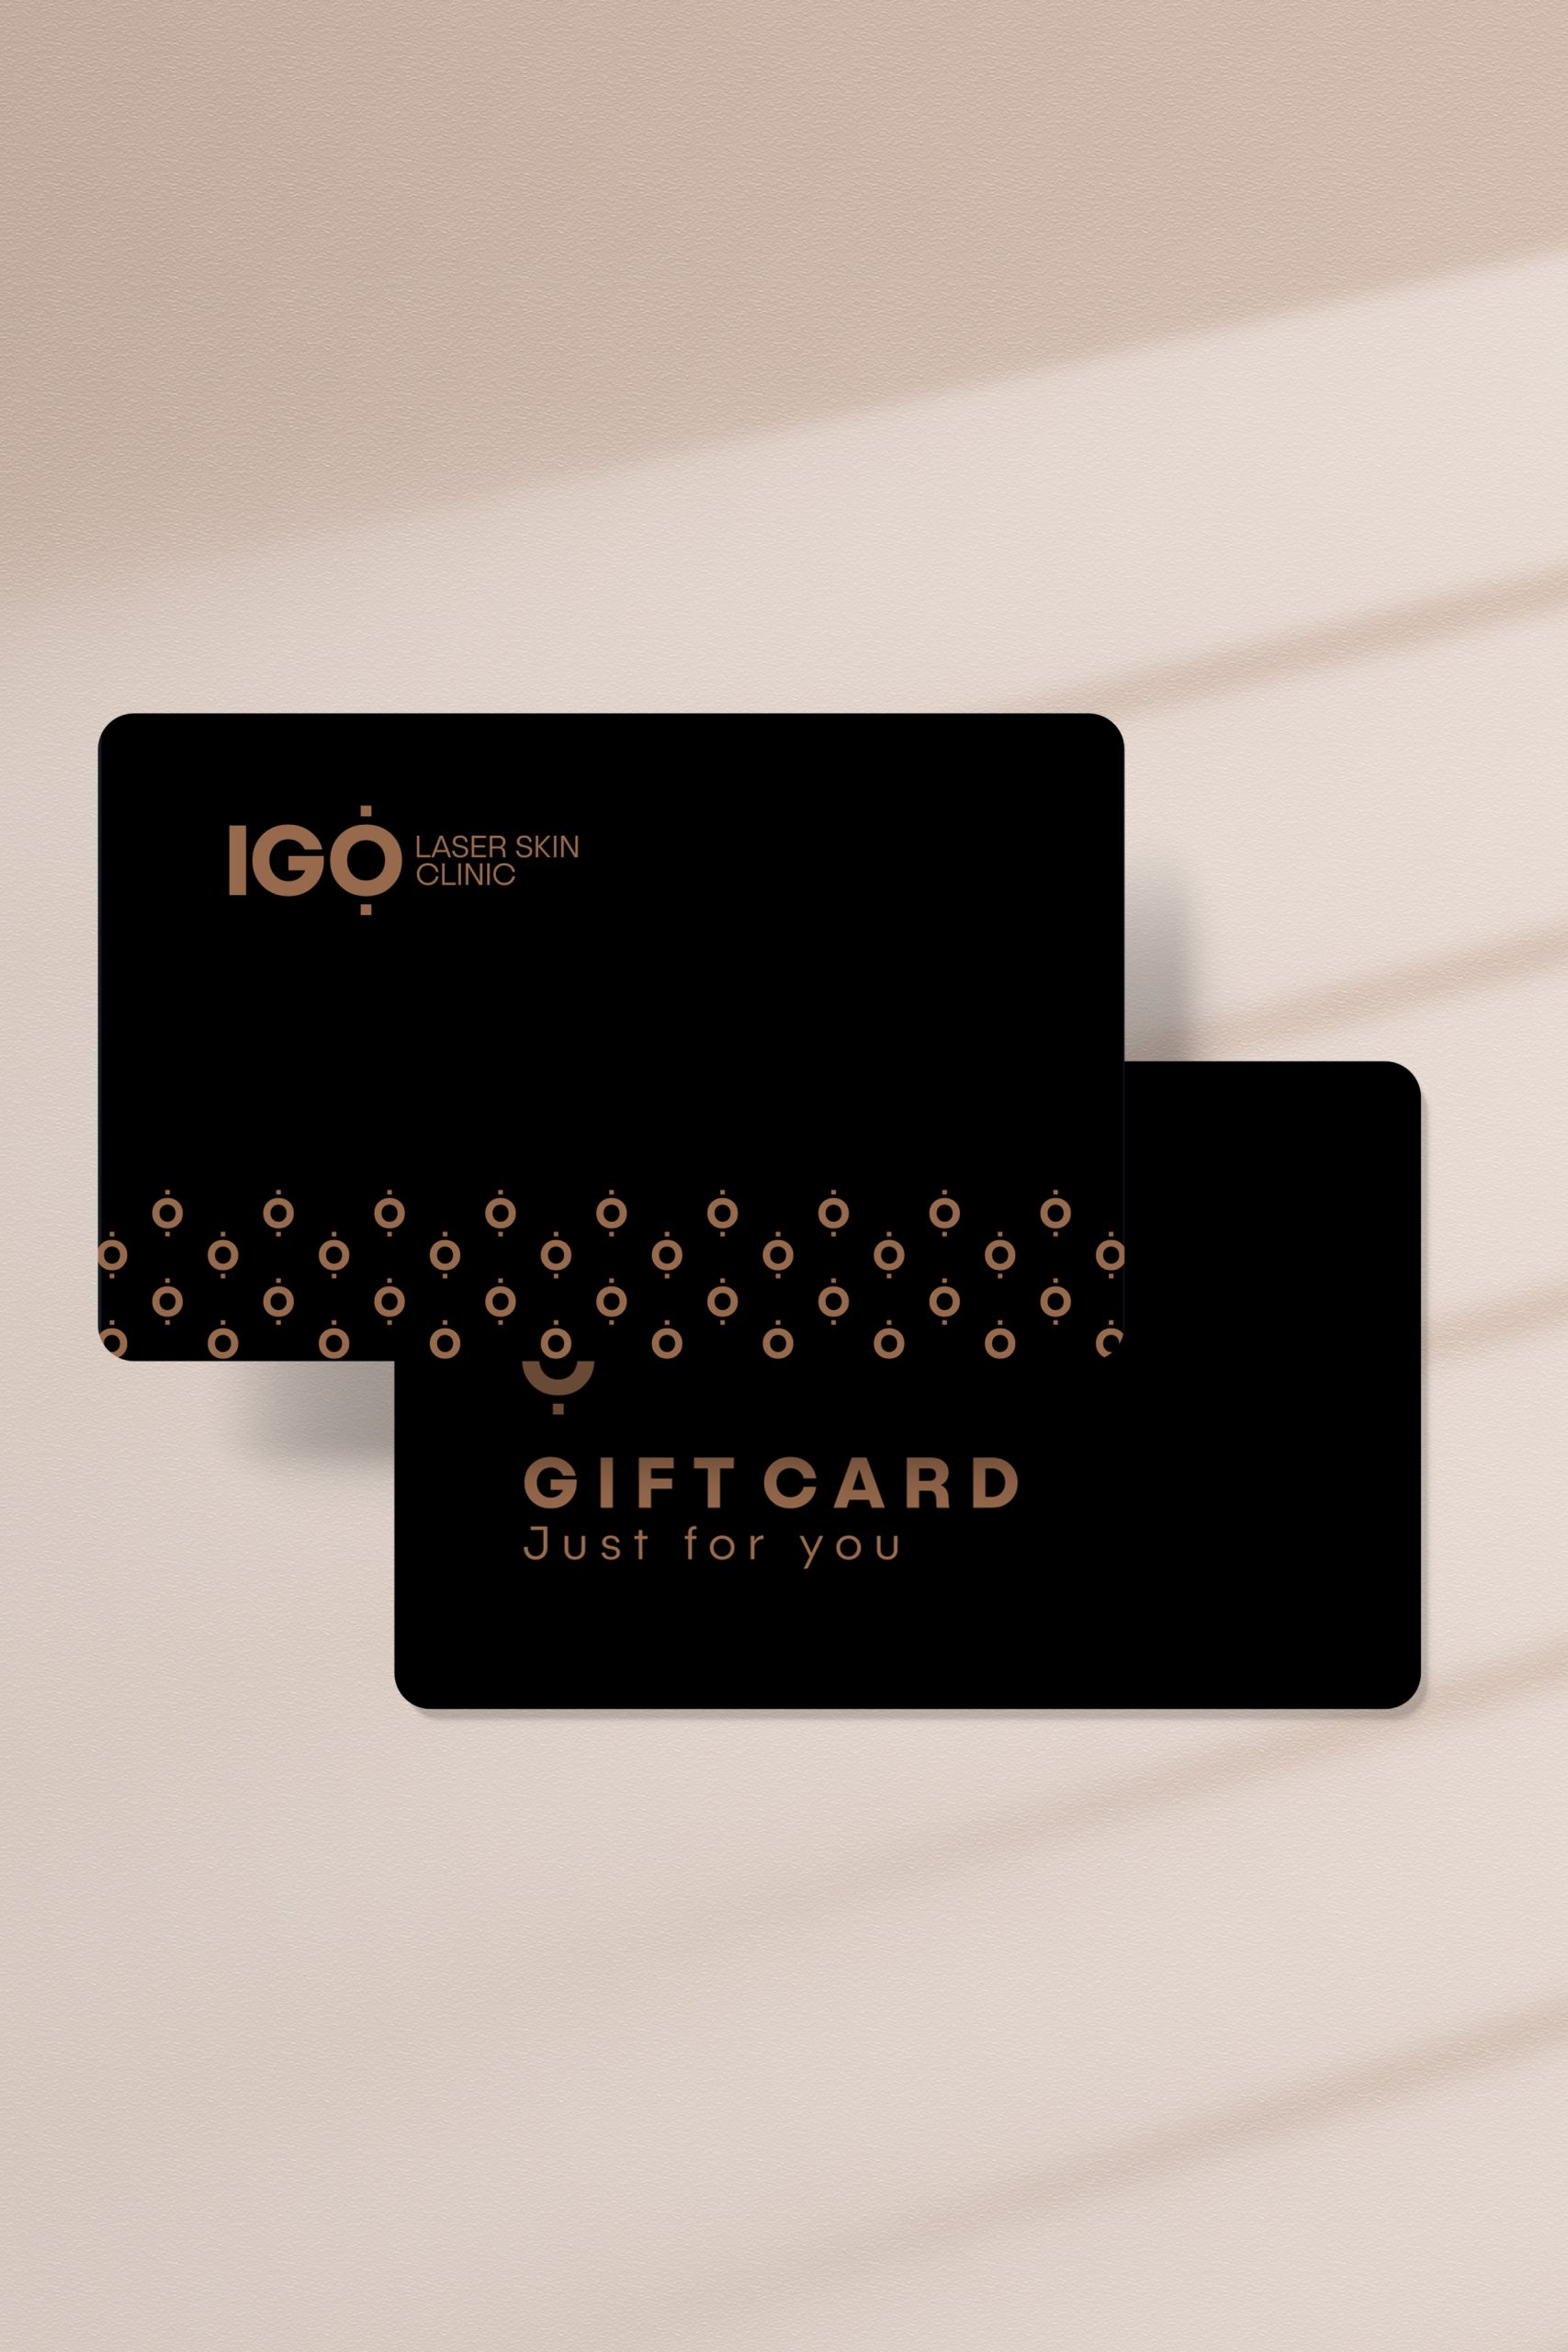 IGO Laser Skin Project Img 14 - Vatra Agency / Founder & CEO Gerton Bejo